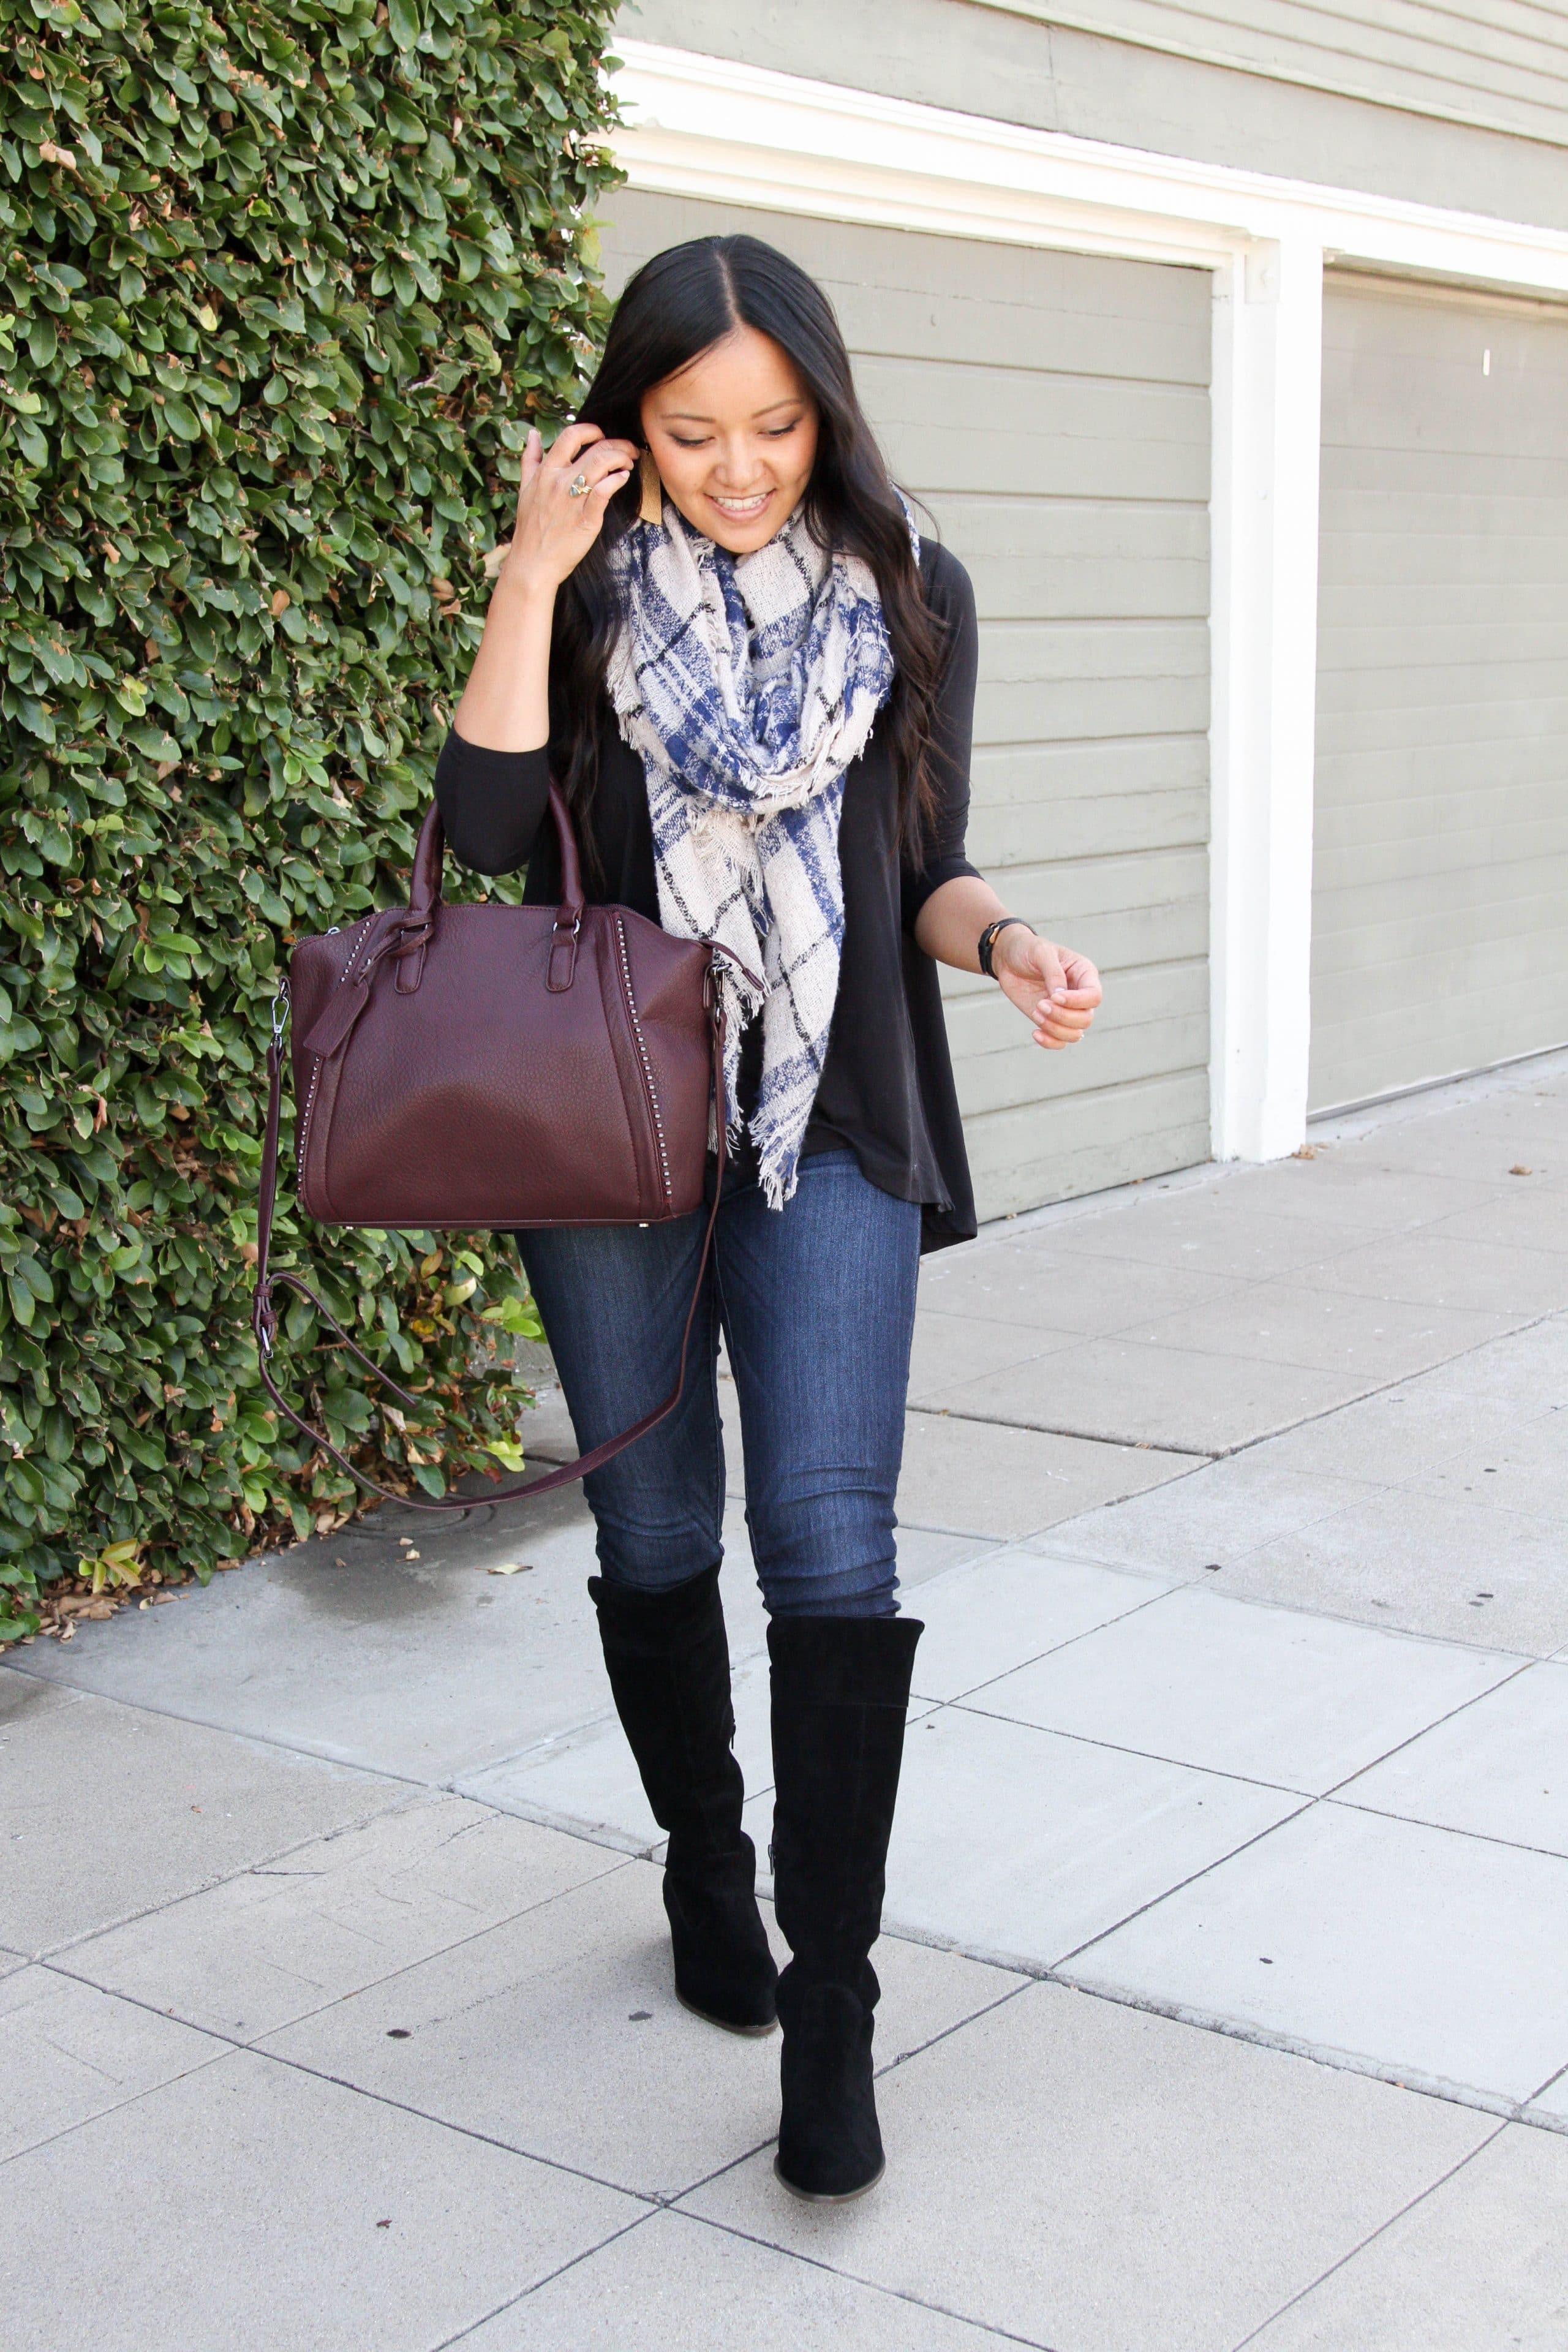 Blanket Scarf + Black top + Black Suede Boots + Skinny Jeans + Merlot Bag